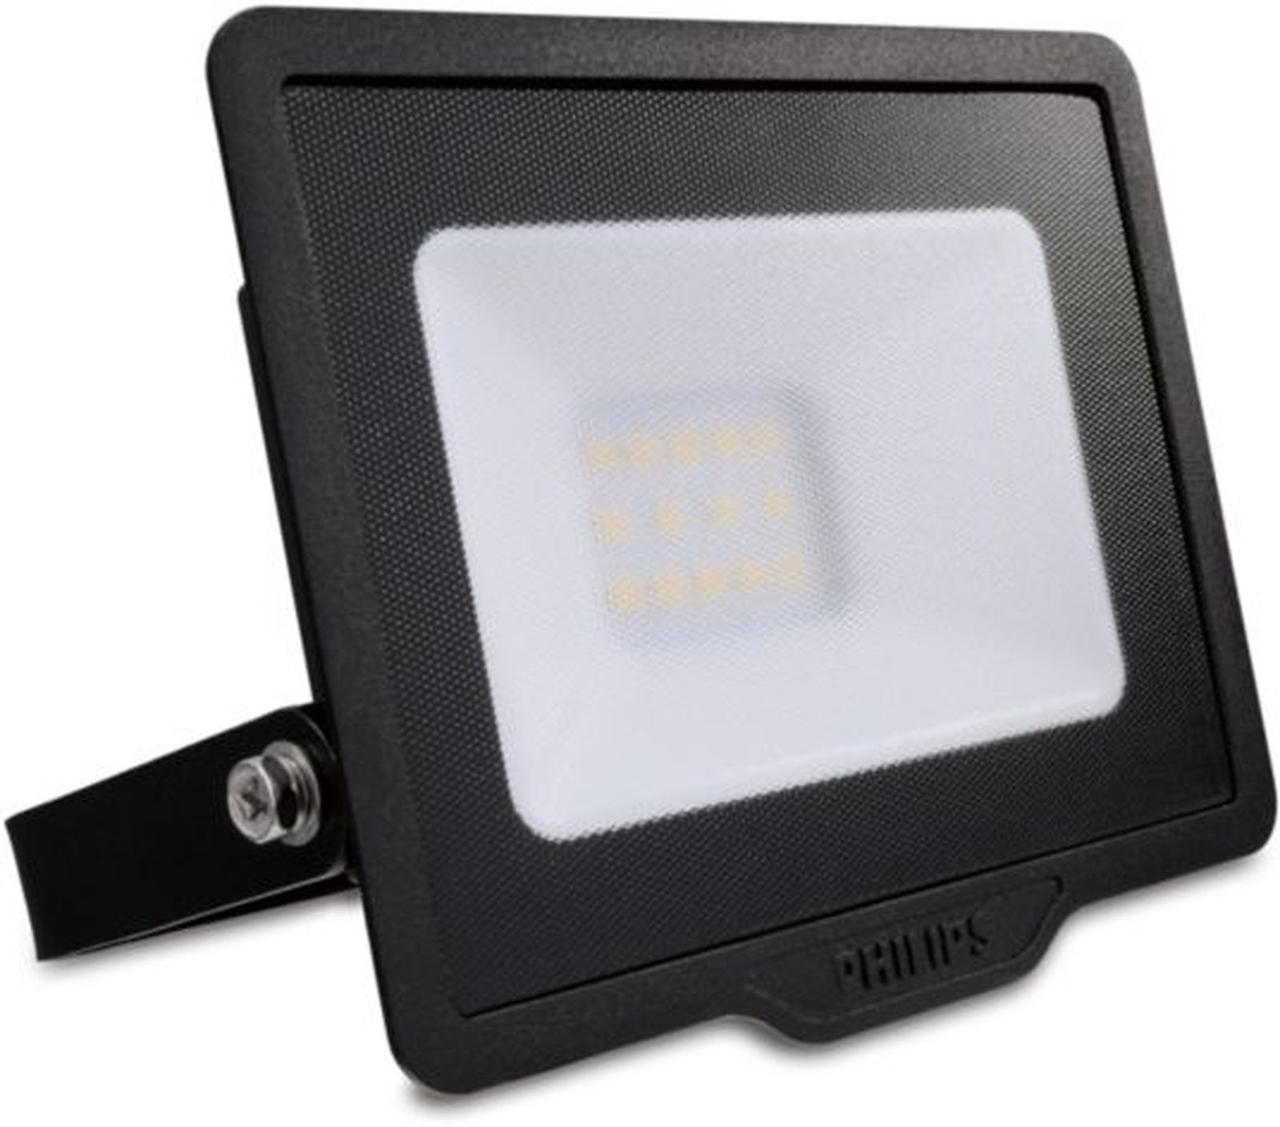 911401732332/871016333012999 Прожектор BVP150 LED8/NW 220-240V 10W SWB CE